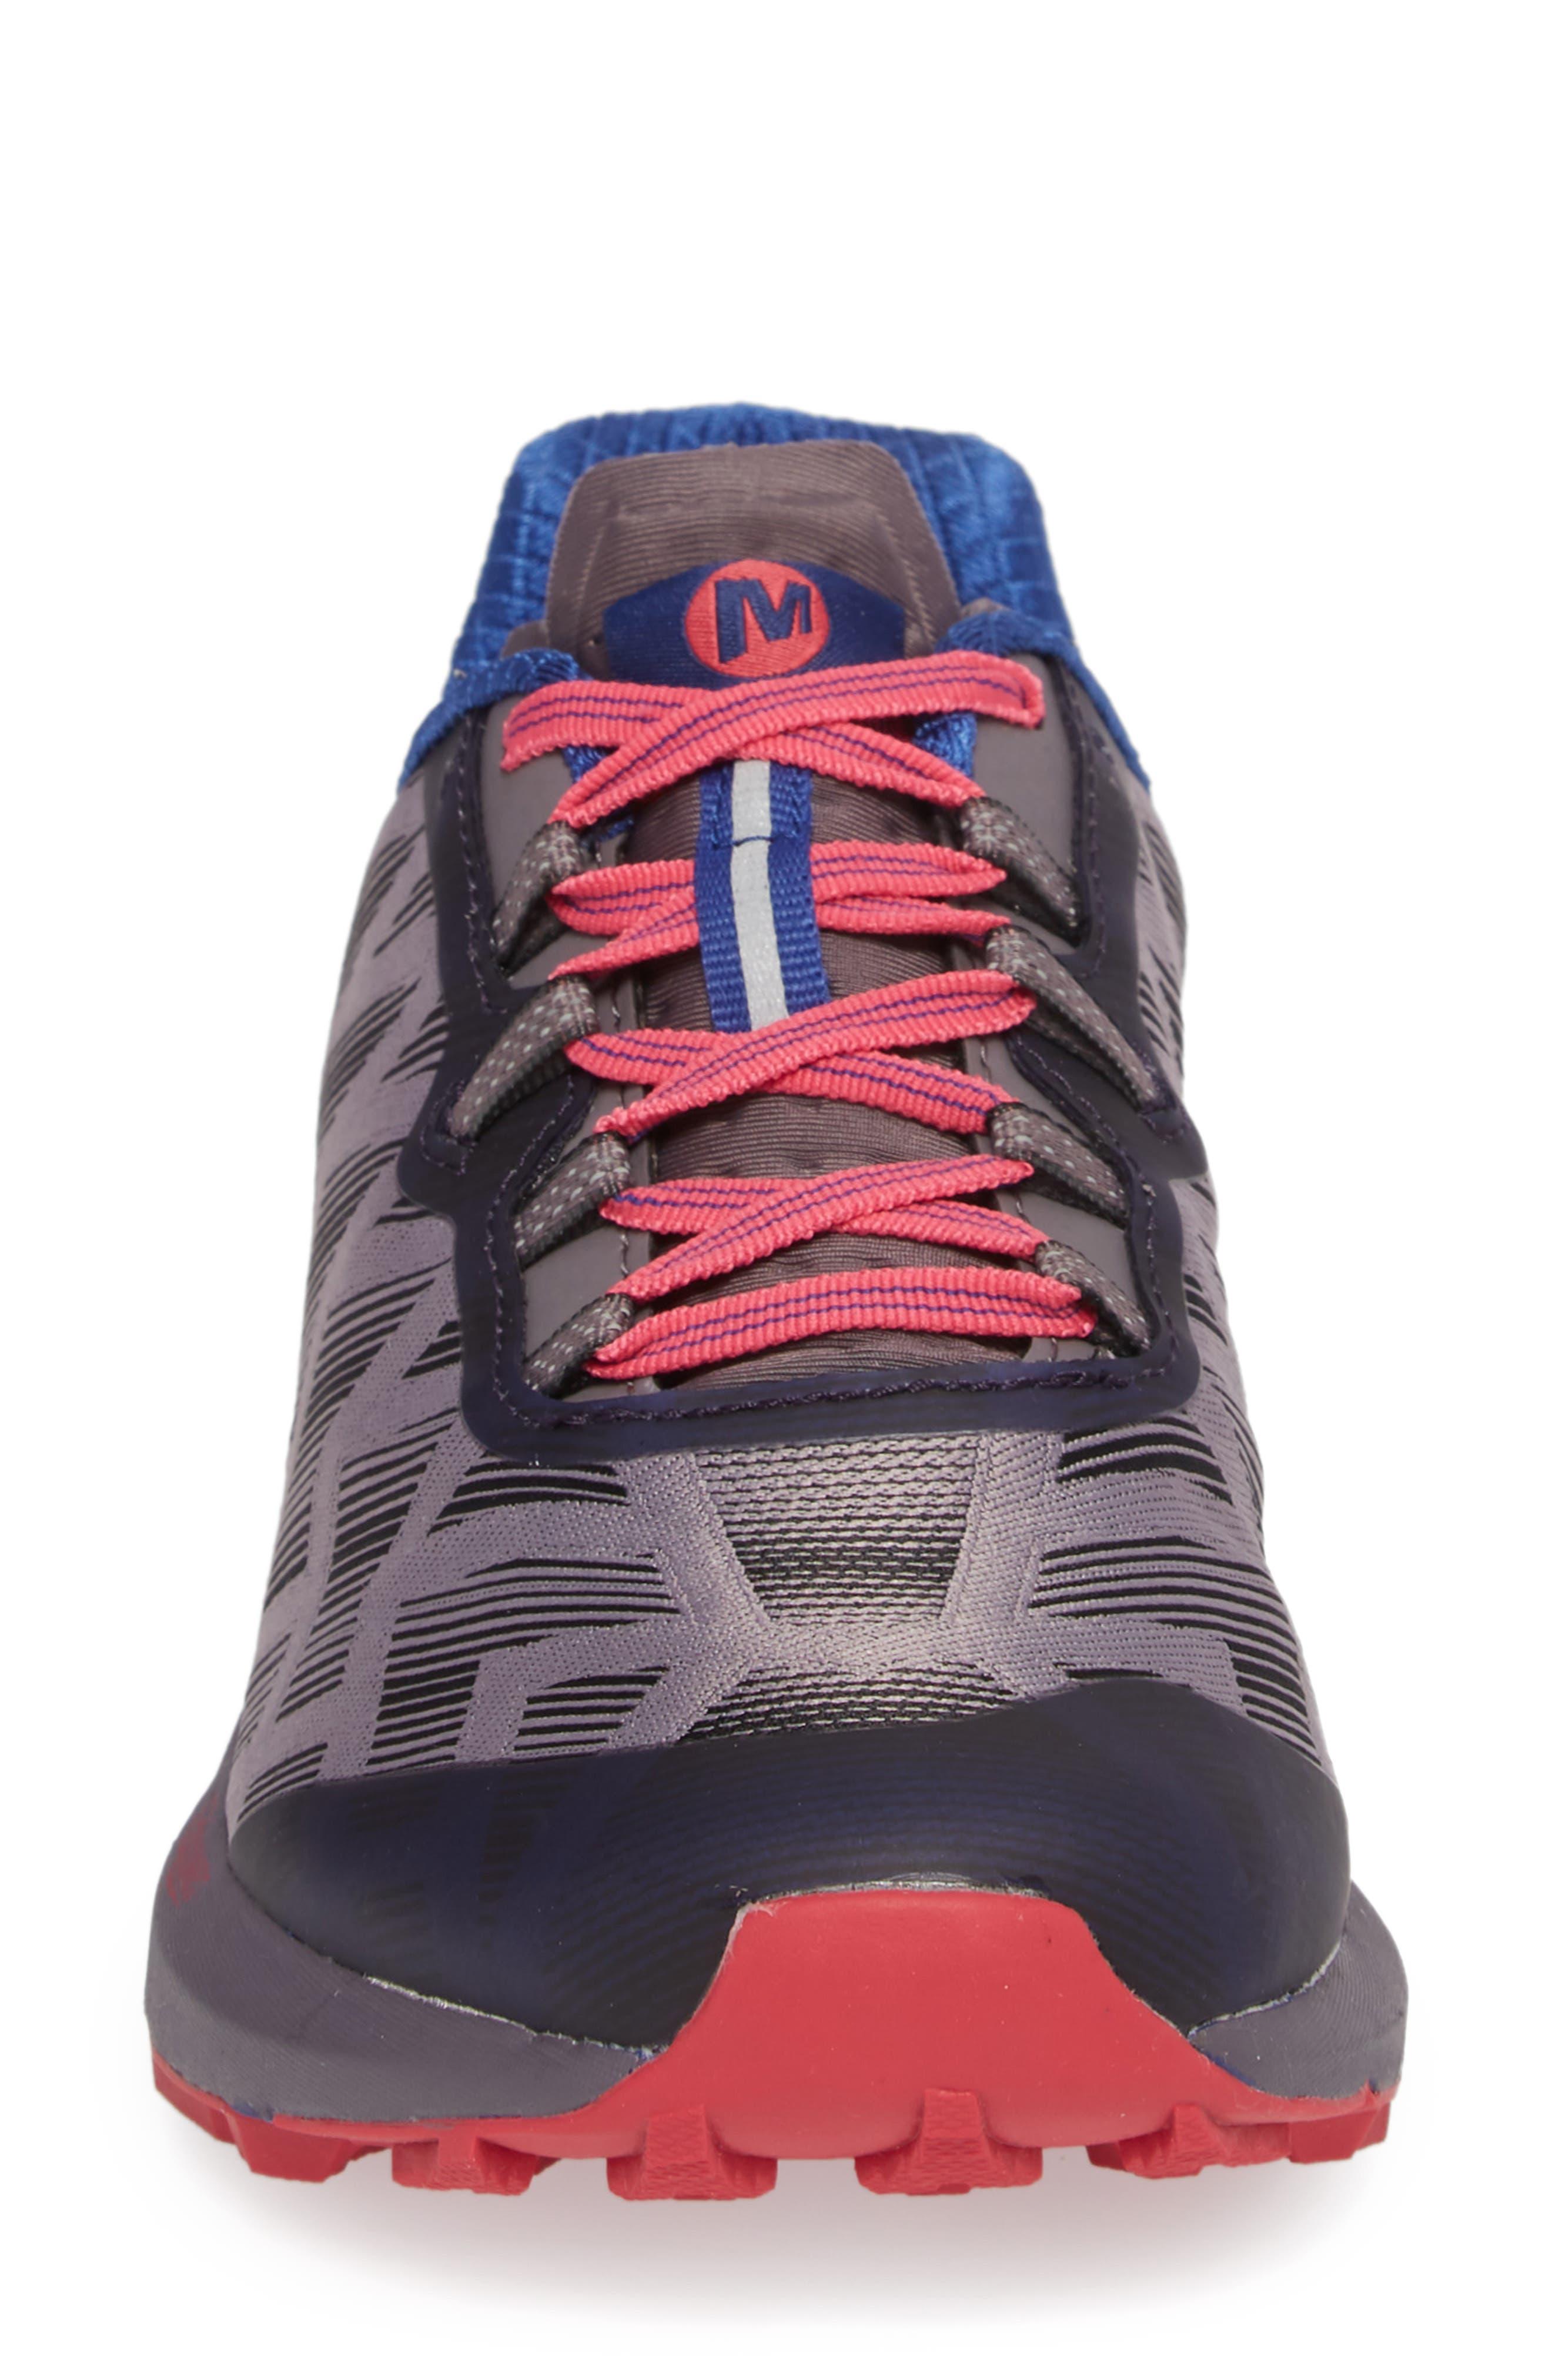 Agility Synthesis Flex Sneaker,                             Alternate thumbnail 4, color,                             SHARK FABRIC